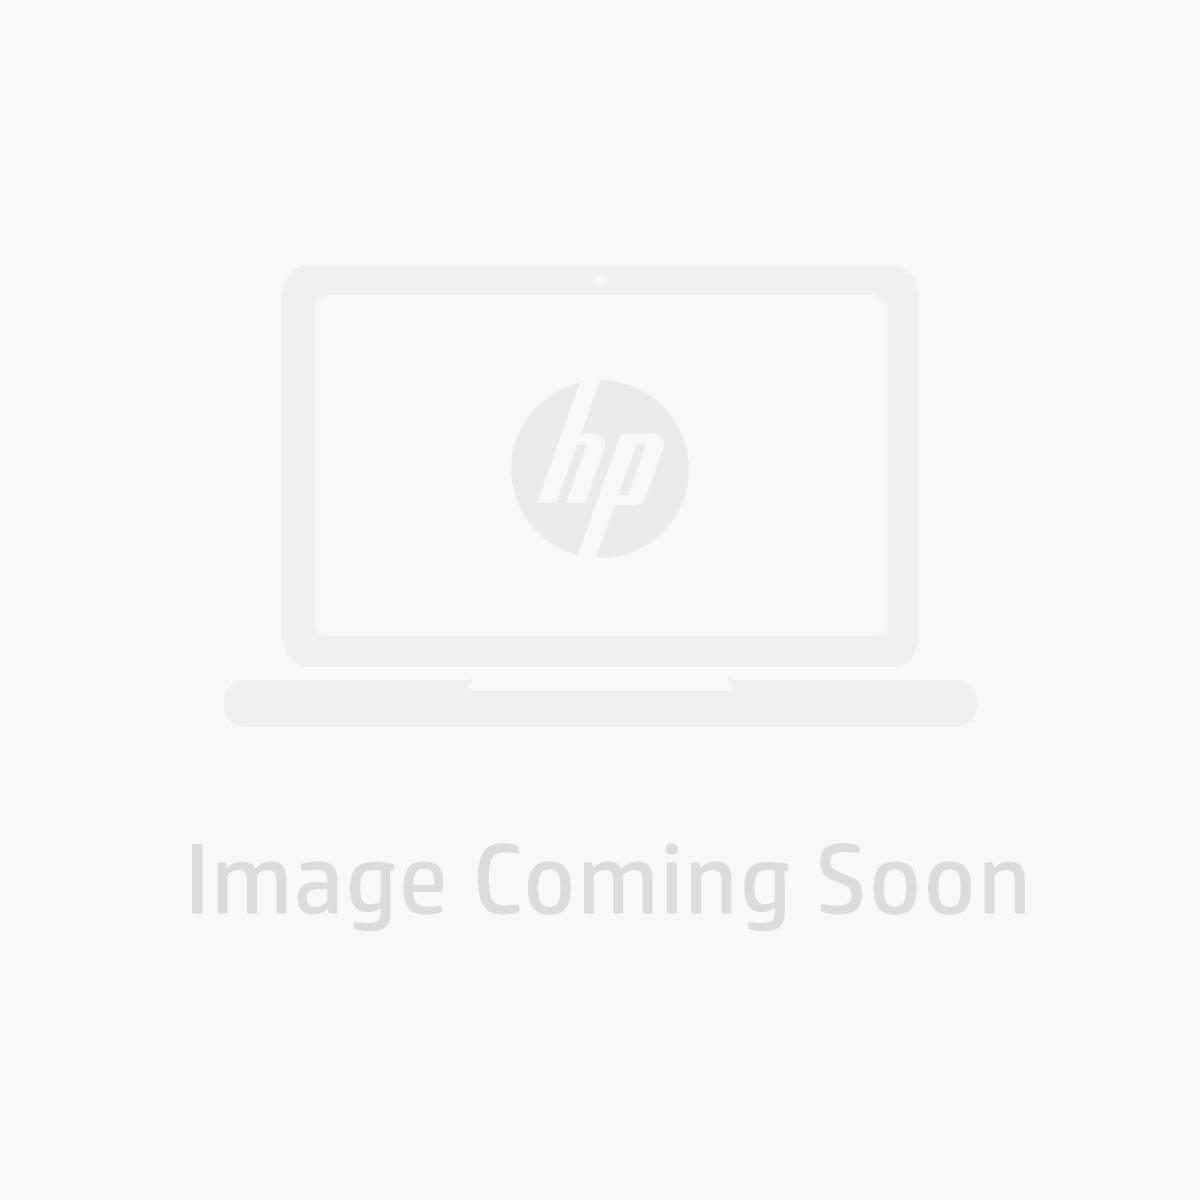 HAMA - HDMI™ STANDARD CABLE, 1.8M